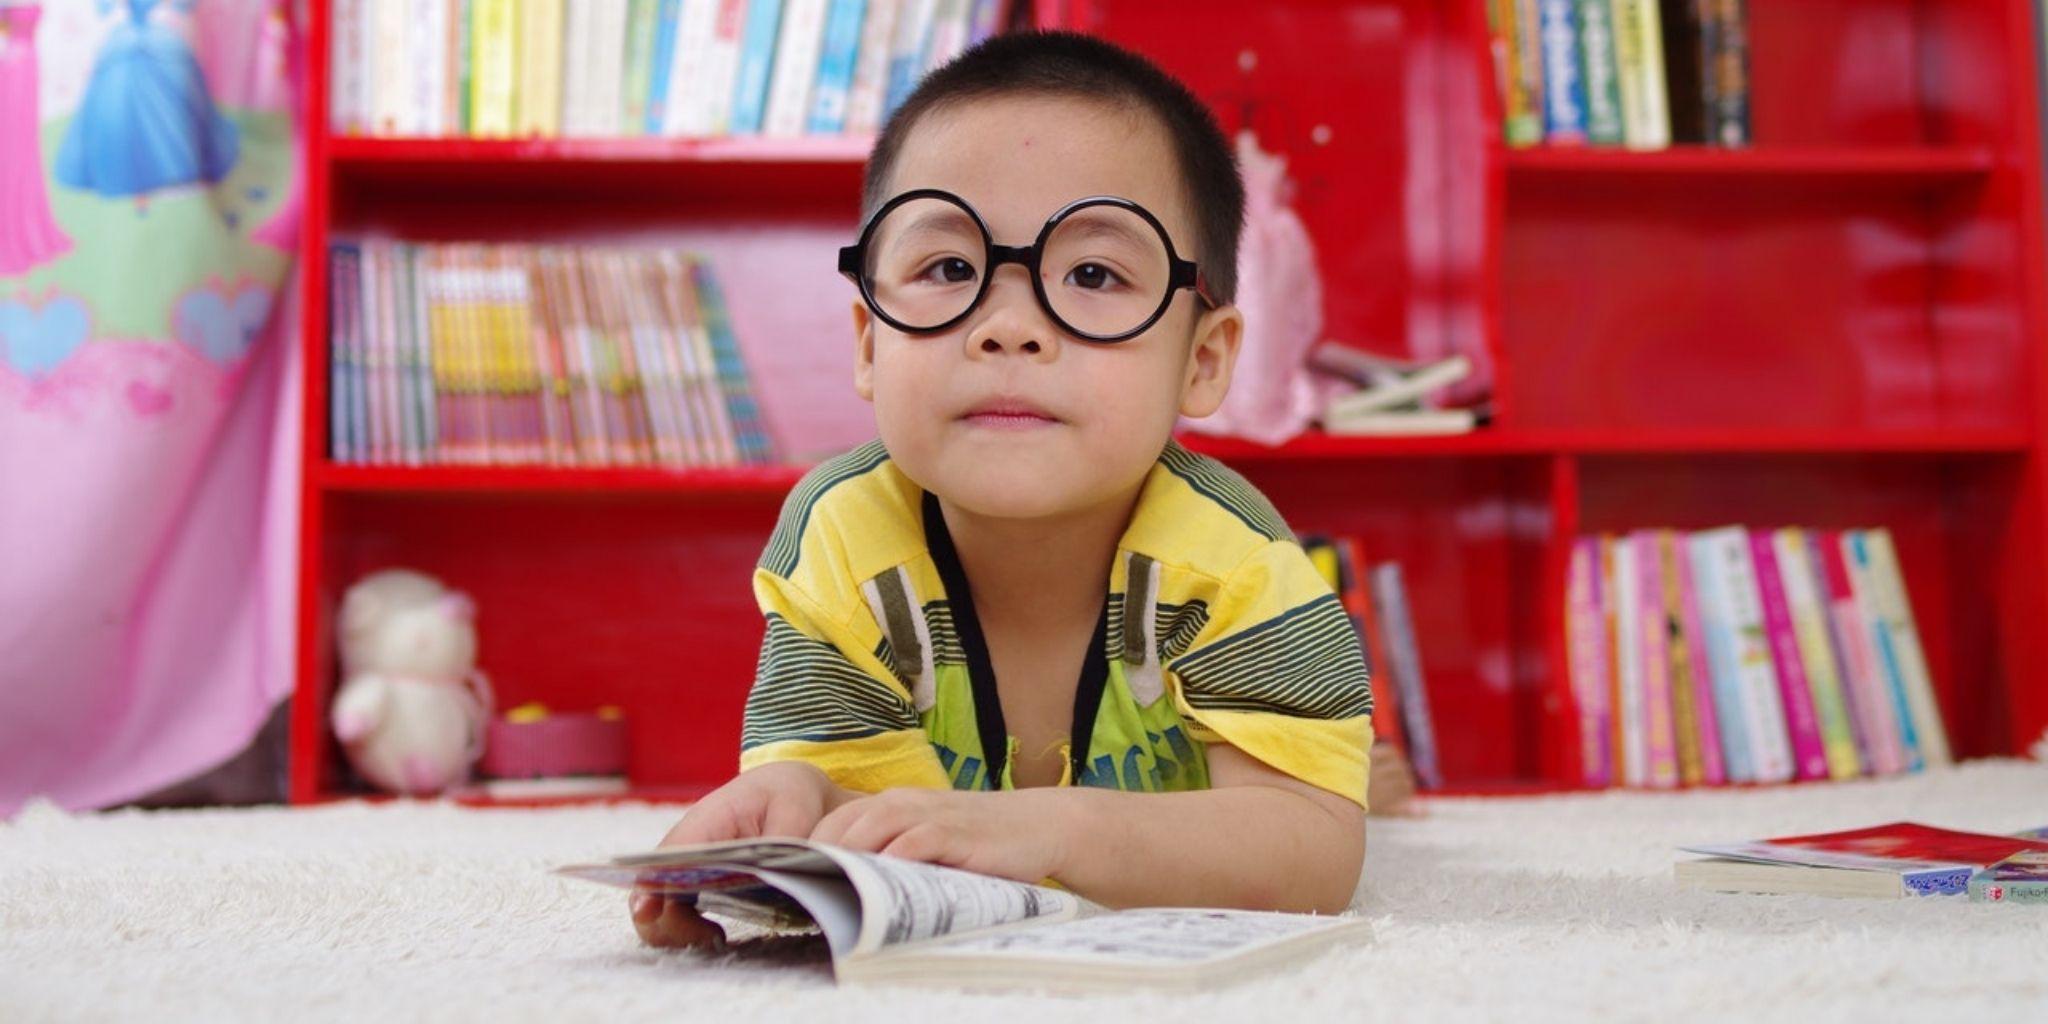 Kids bookshelf ideas: how to set up a bookshelf for kids